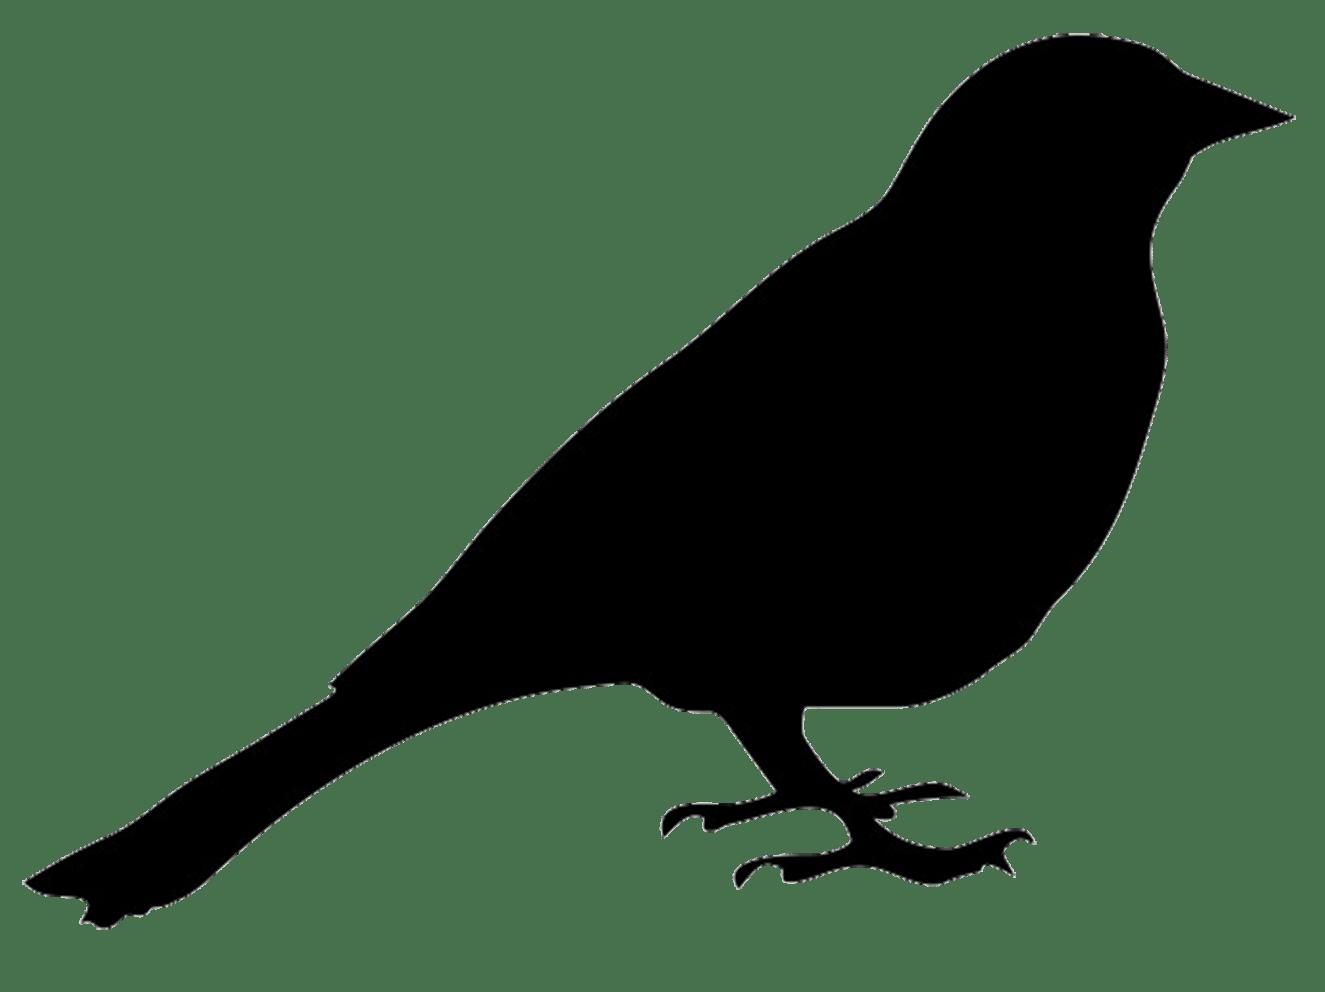 collection of birds. Bird vector png